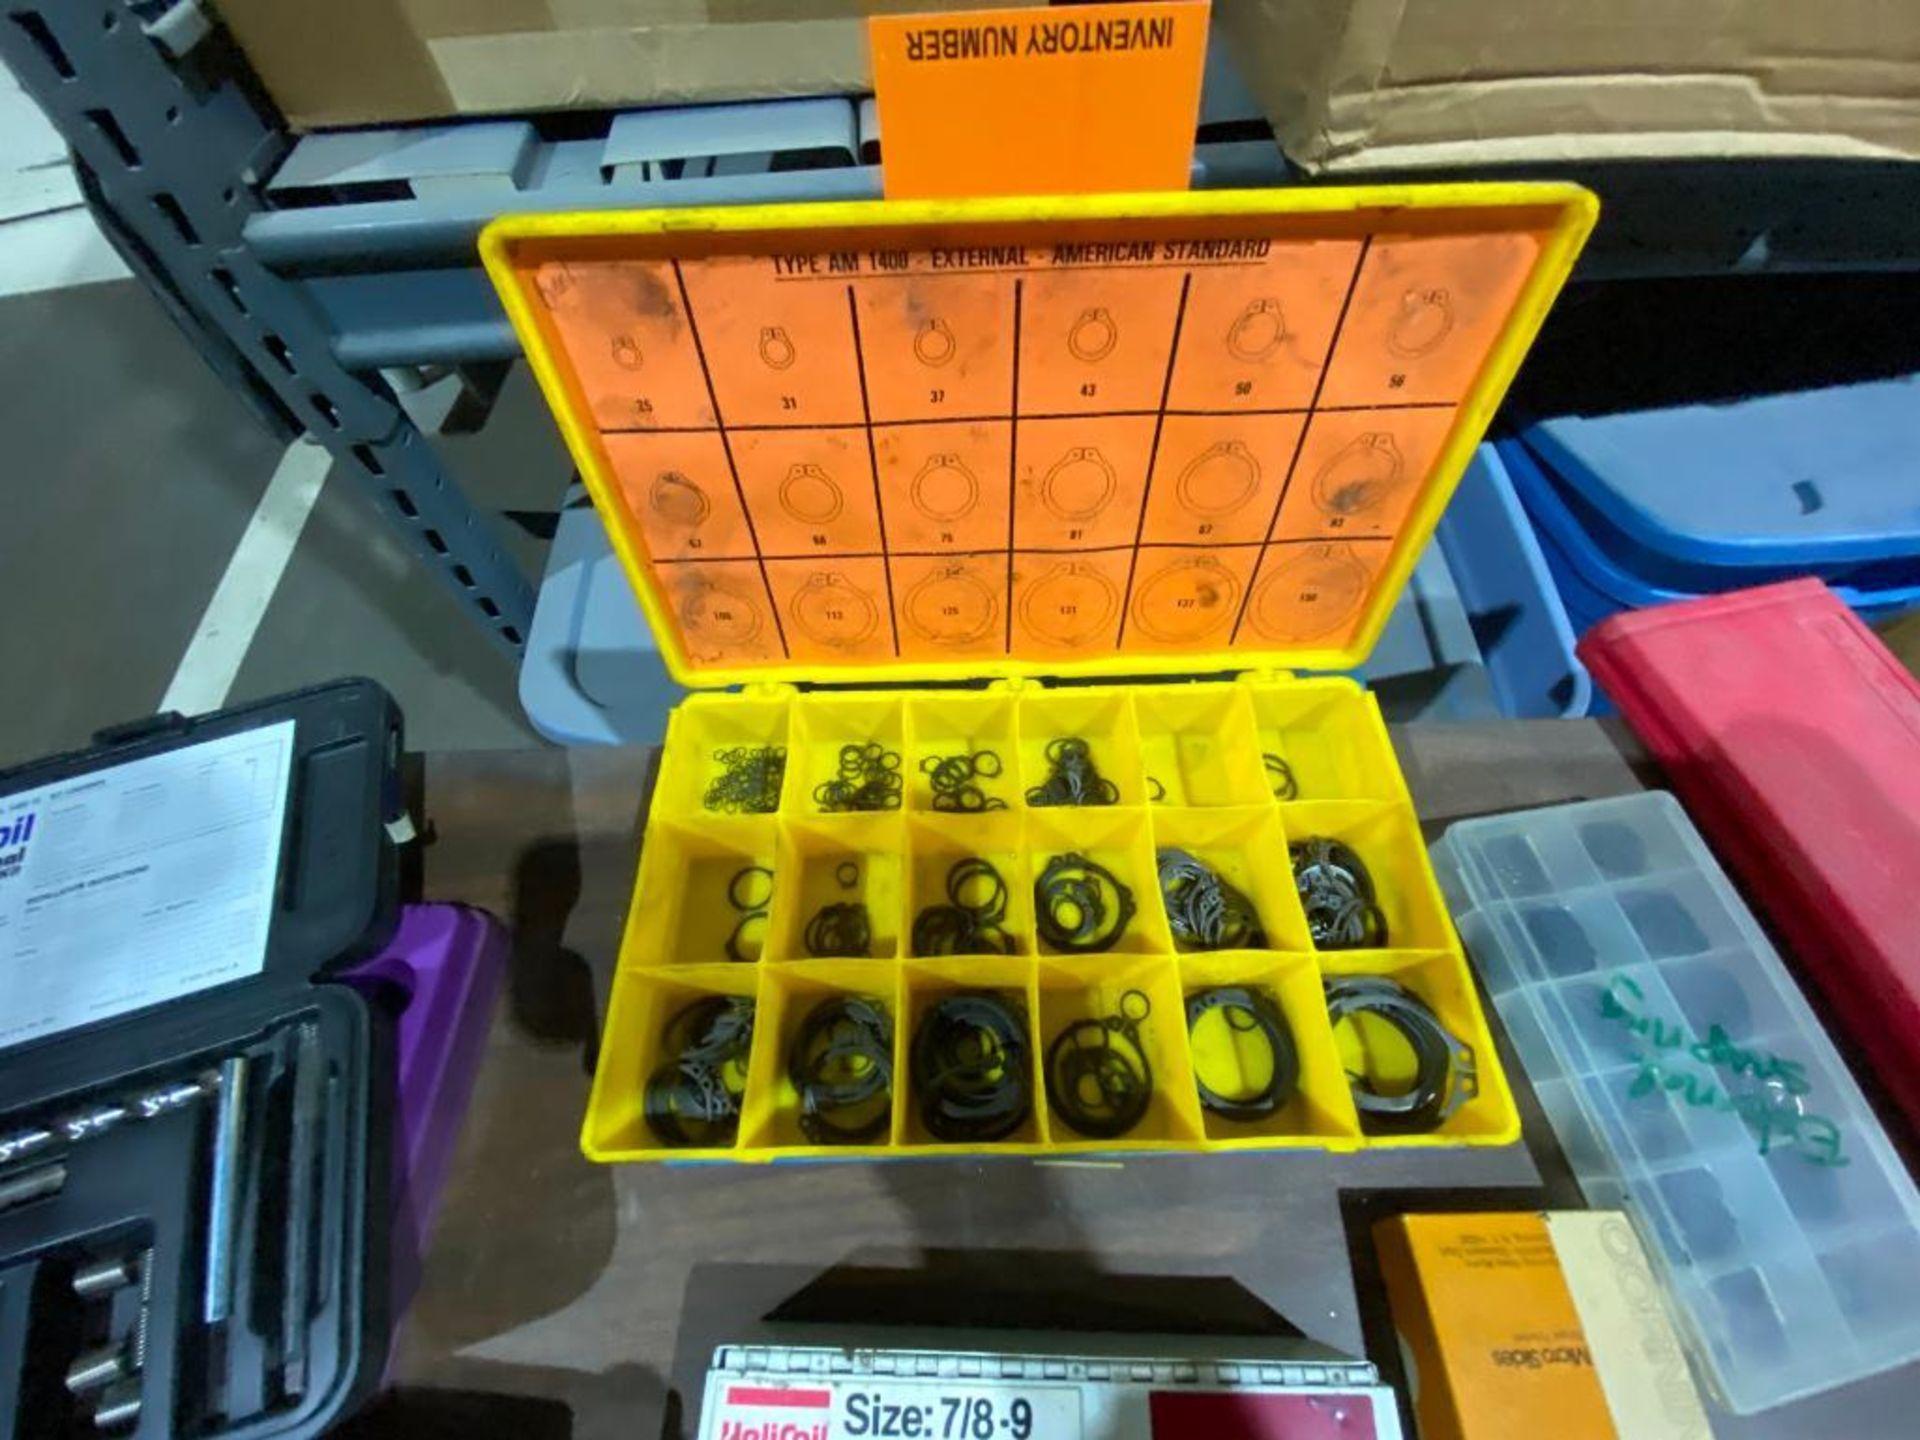 measuring equipment and thread repair - Image 7 of 18